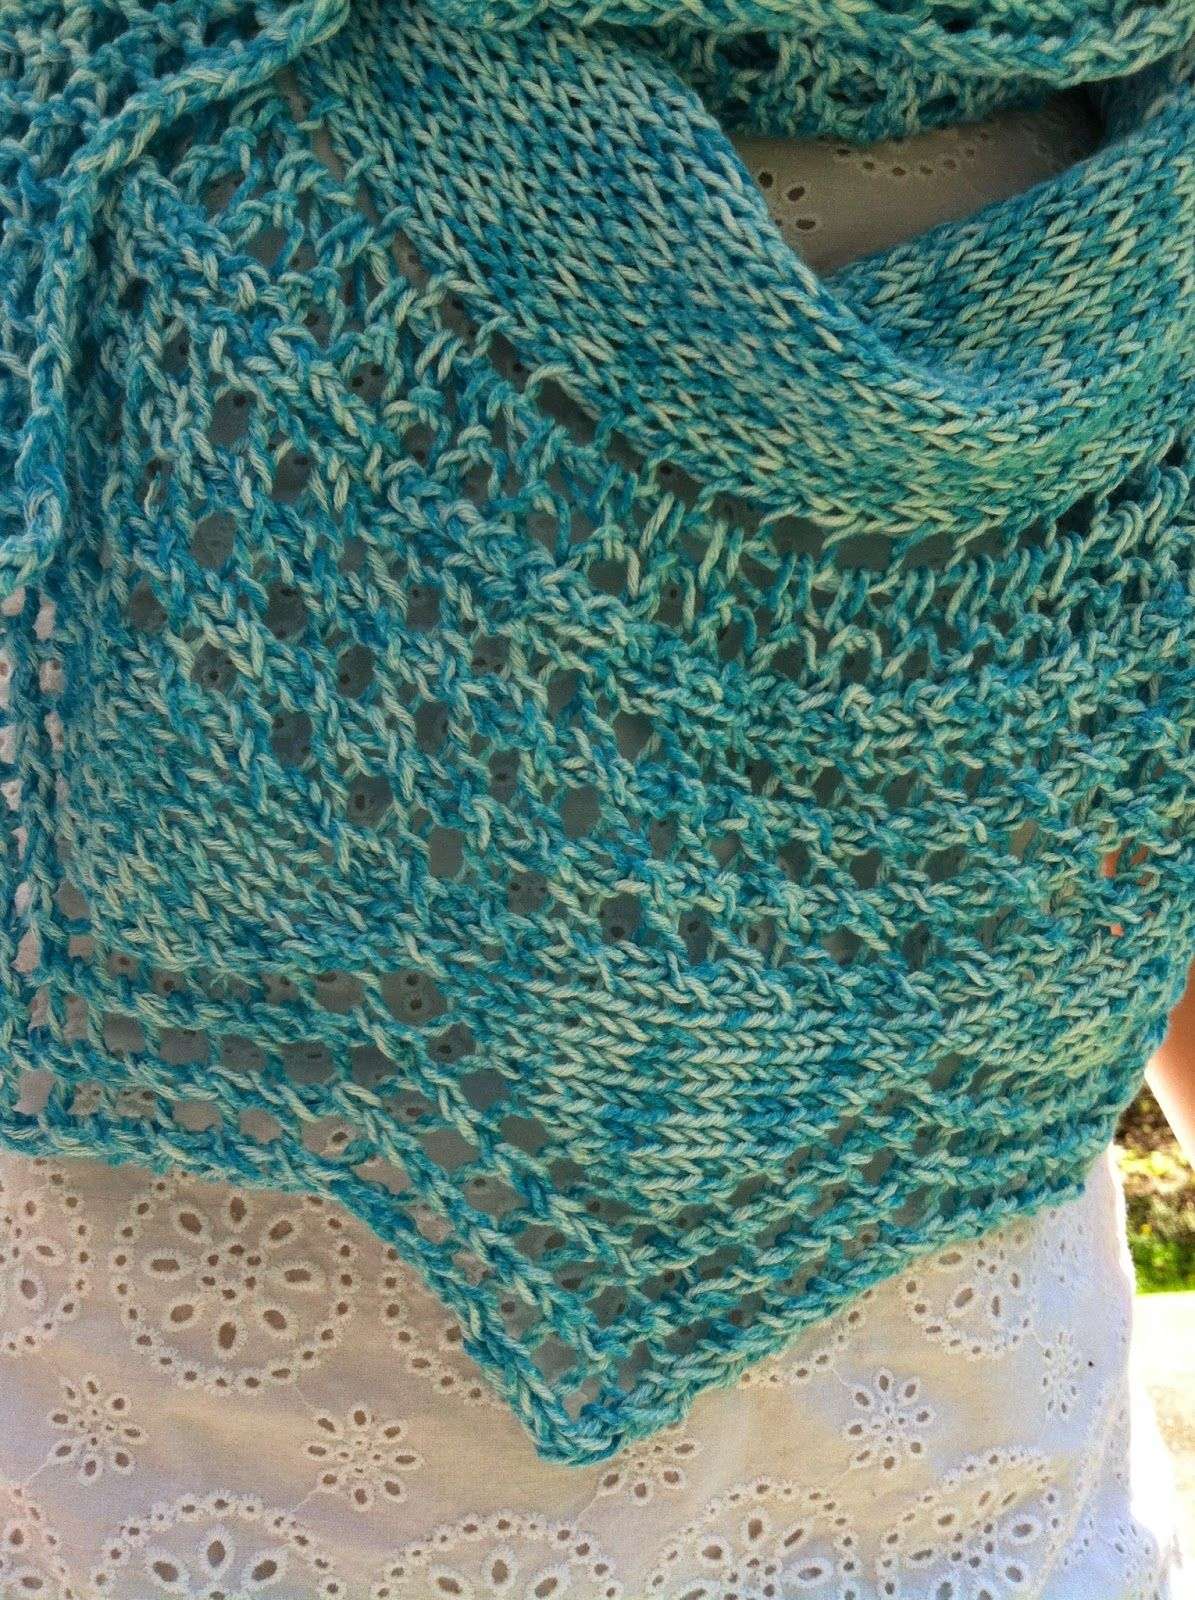 Knitting Cottage: Una Sciarpa turchese per l'estate